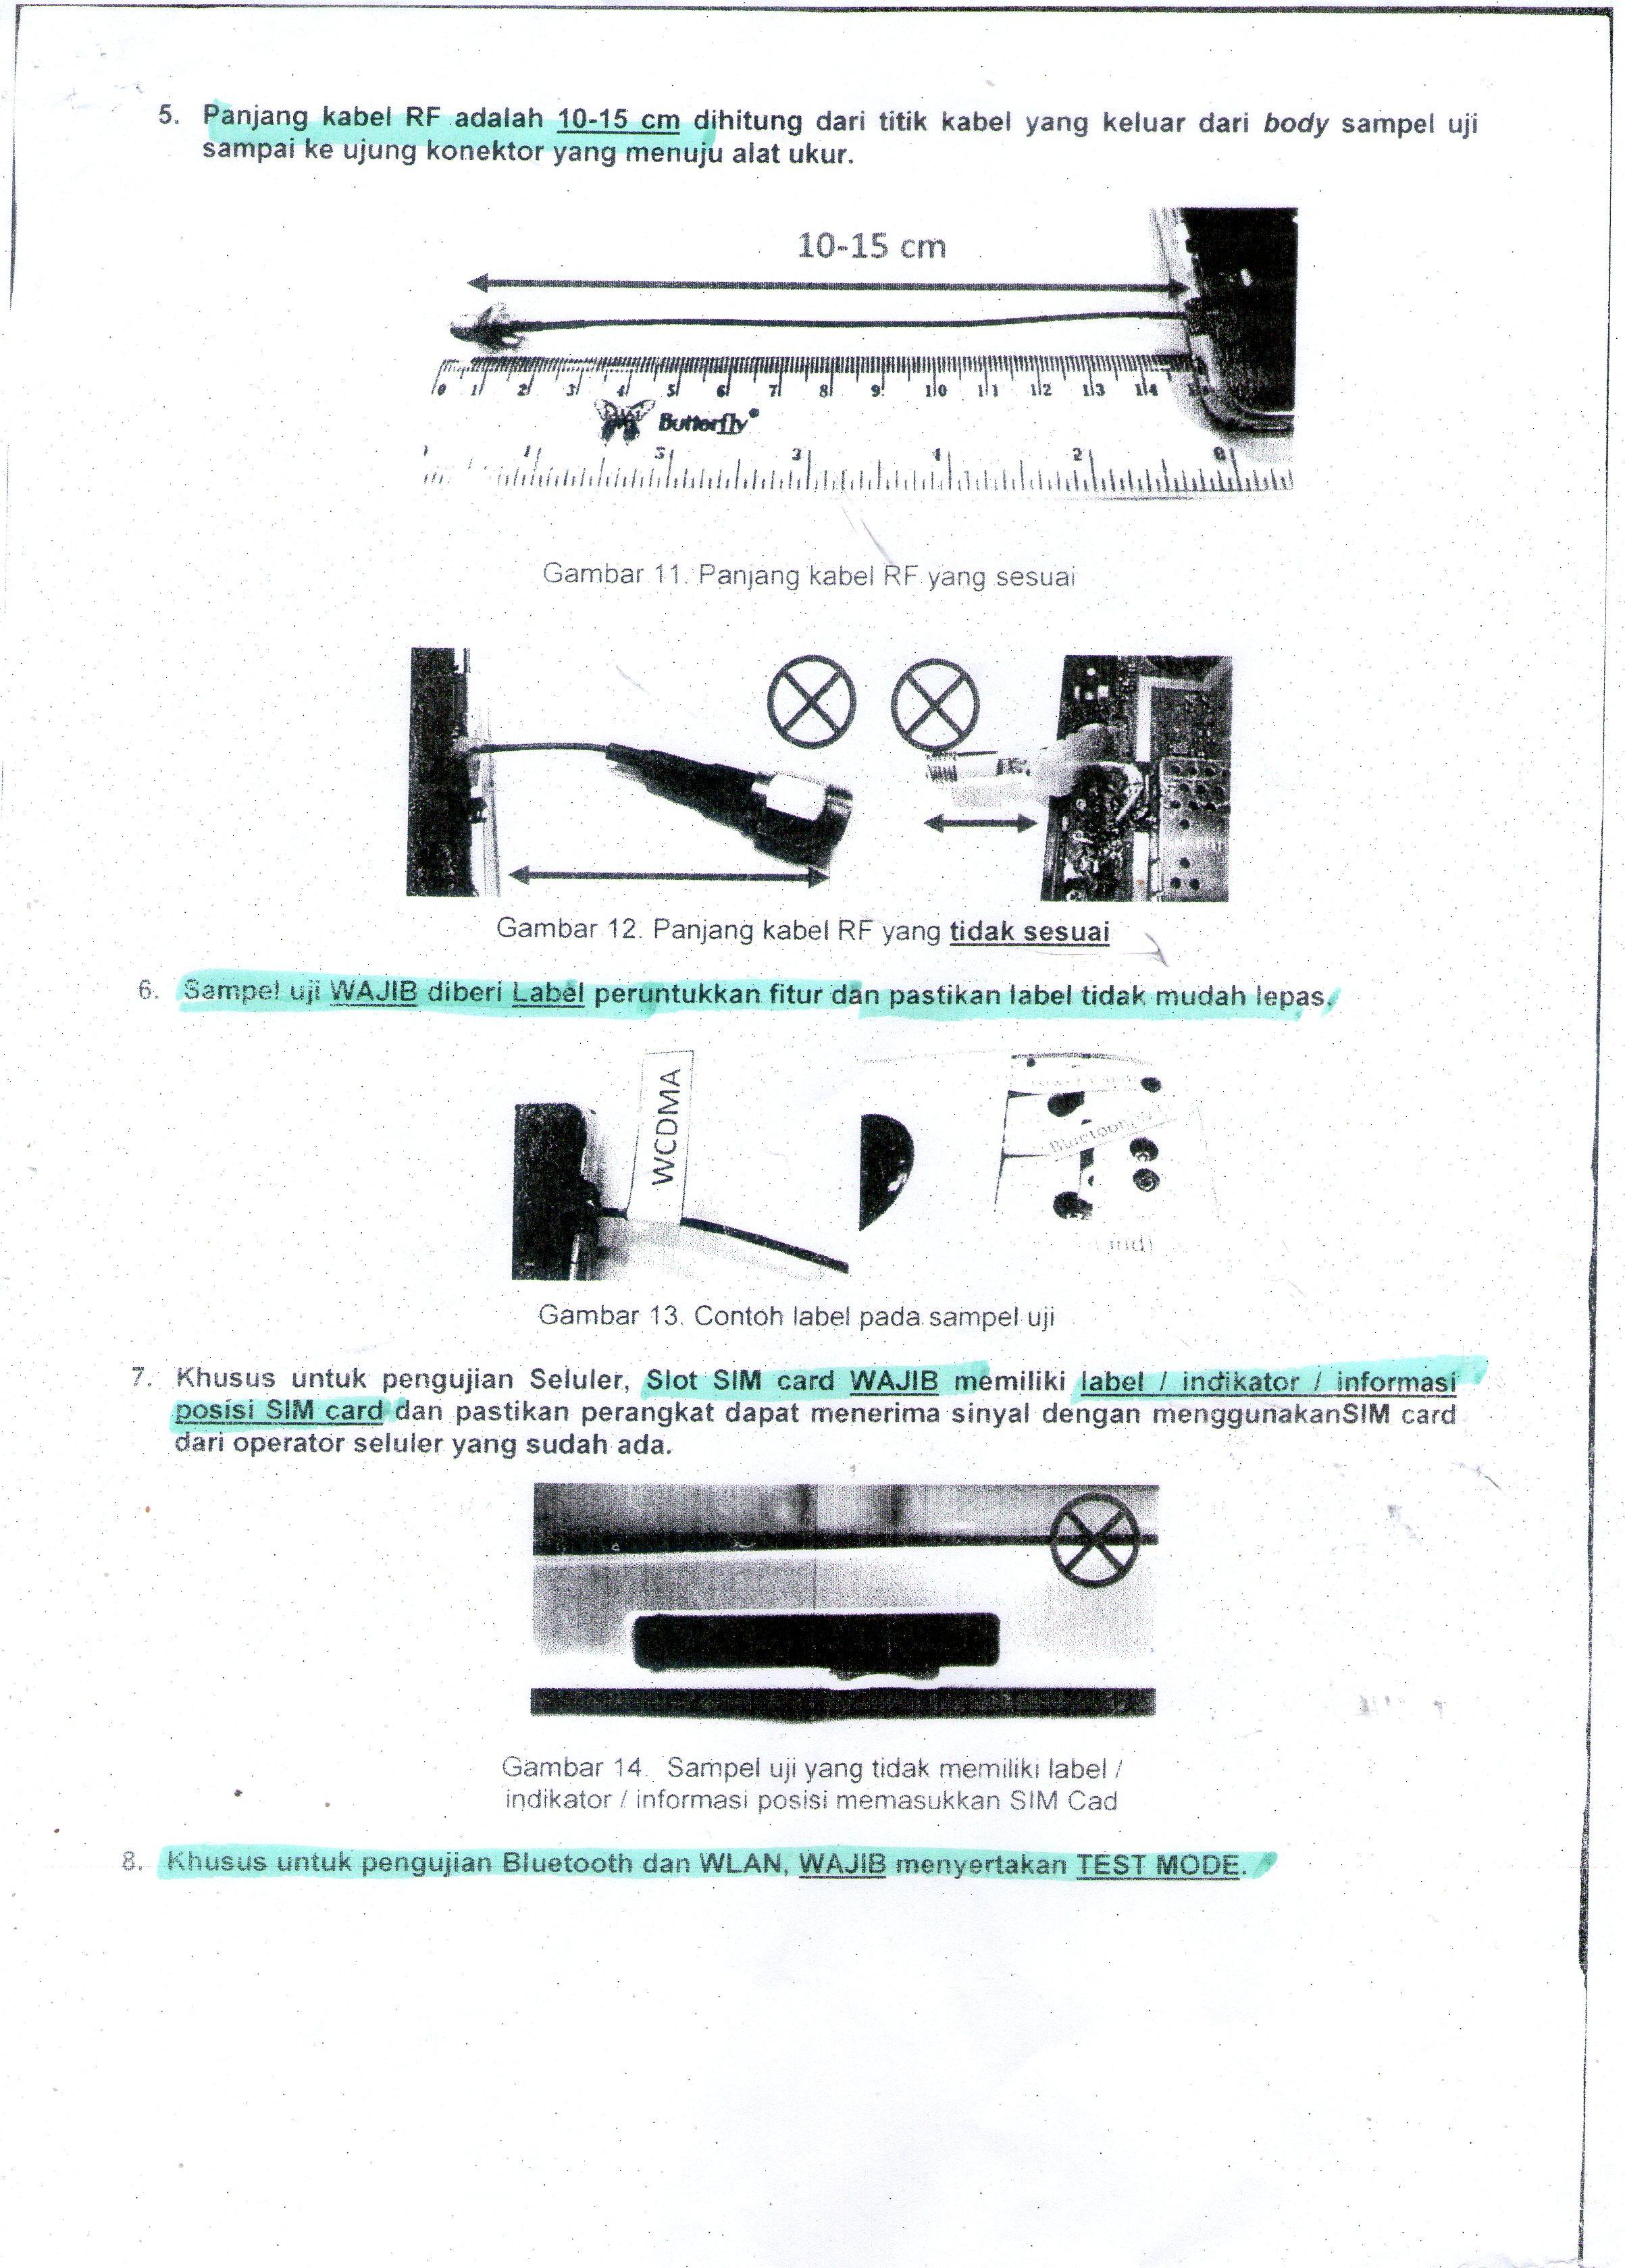 SDPPI lab requirement image3